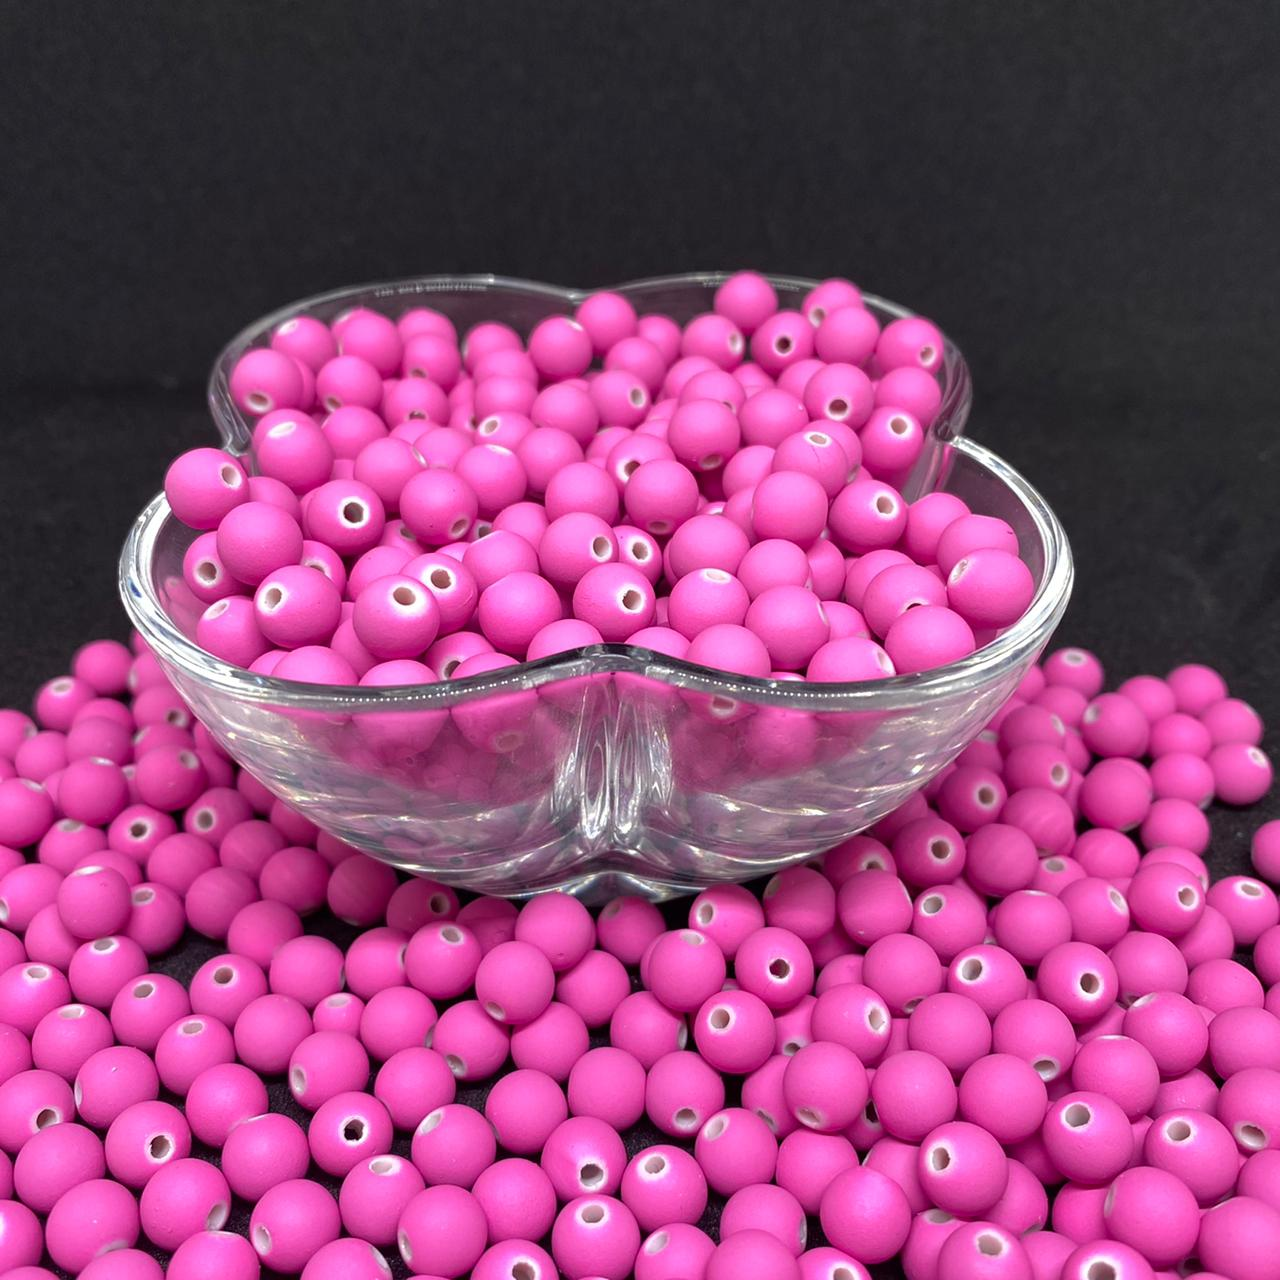 Bolinha emborrachada  8mm rosa taffy - 25g 5145